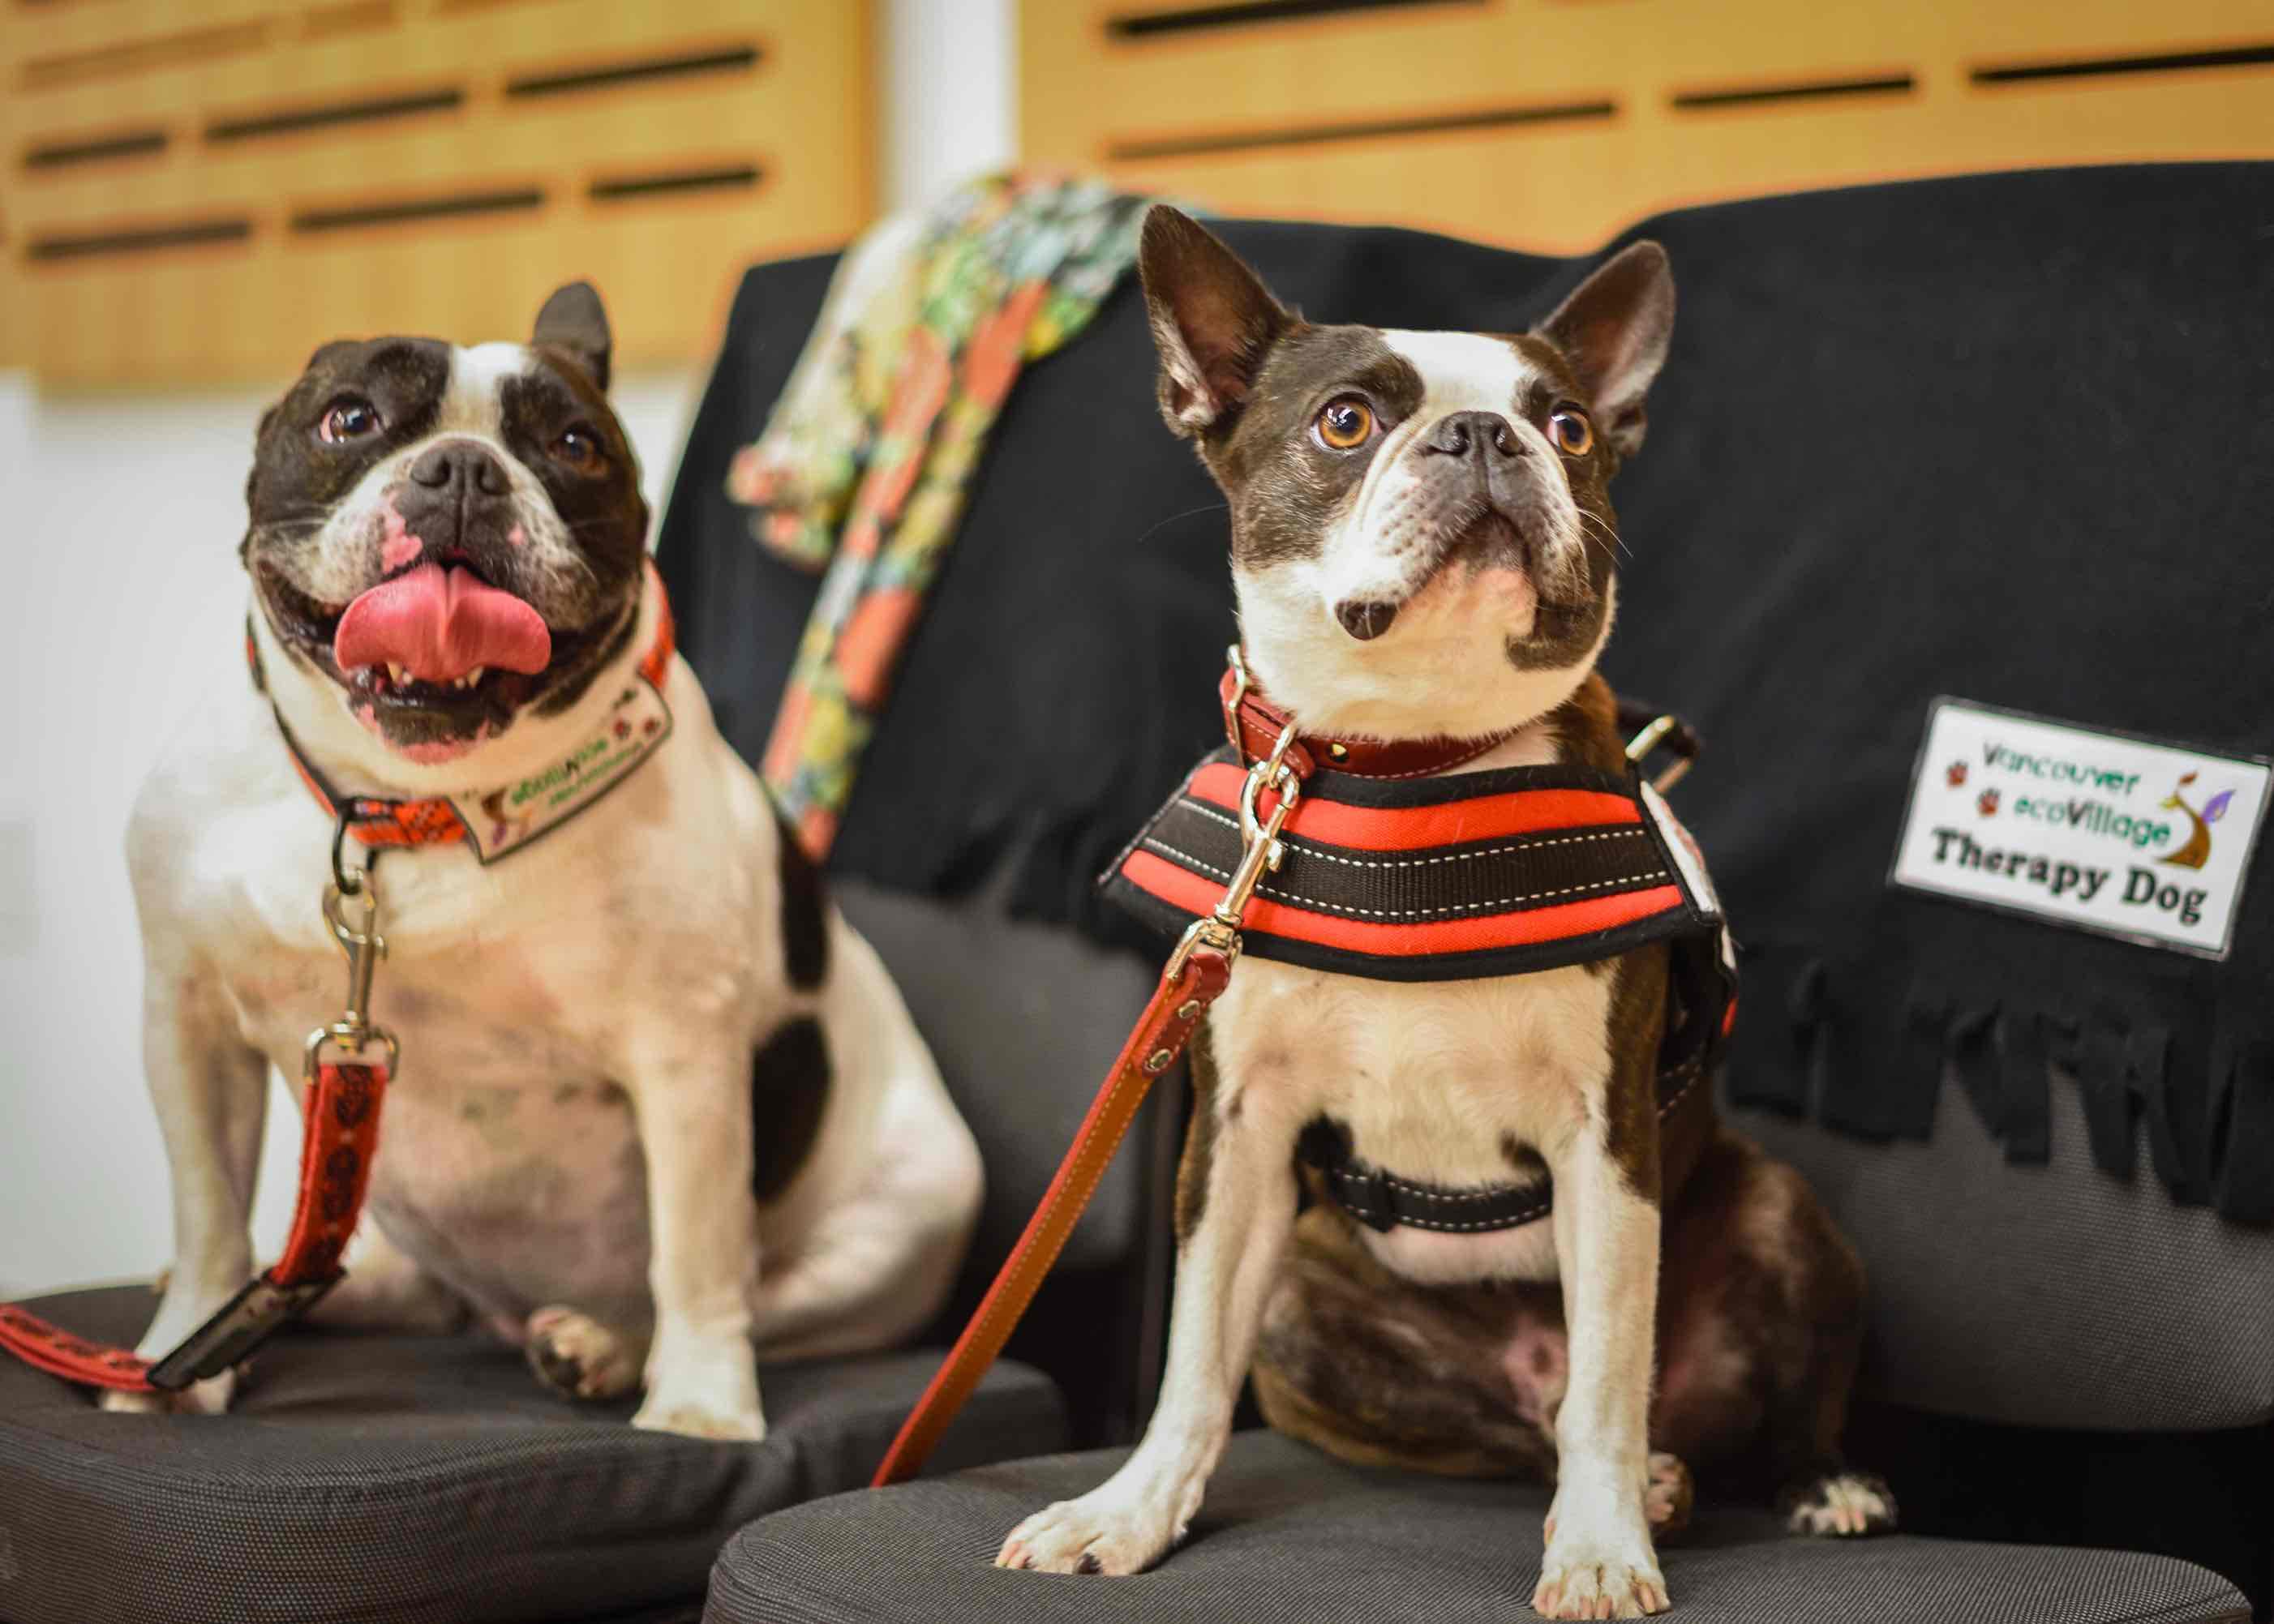 French Bulldog & Boston Terrier